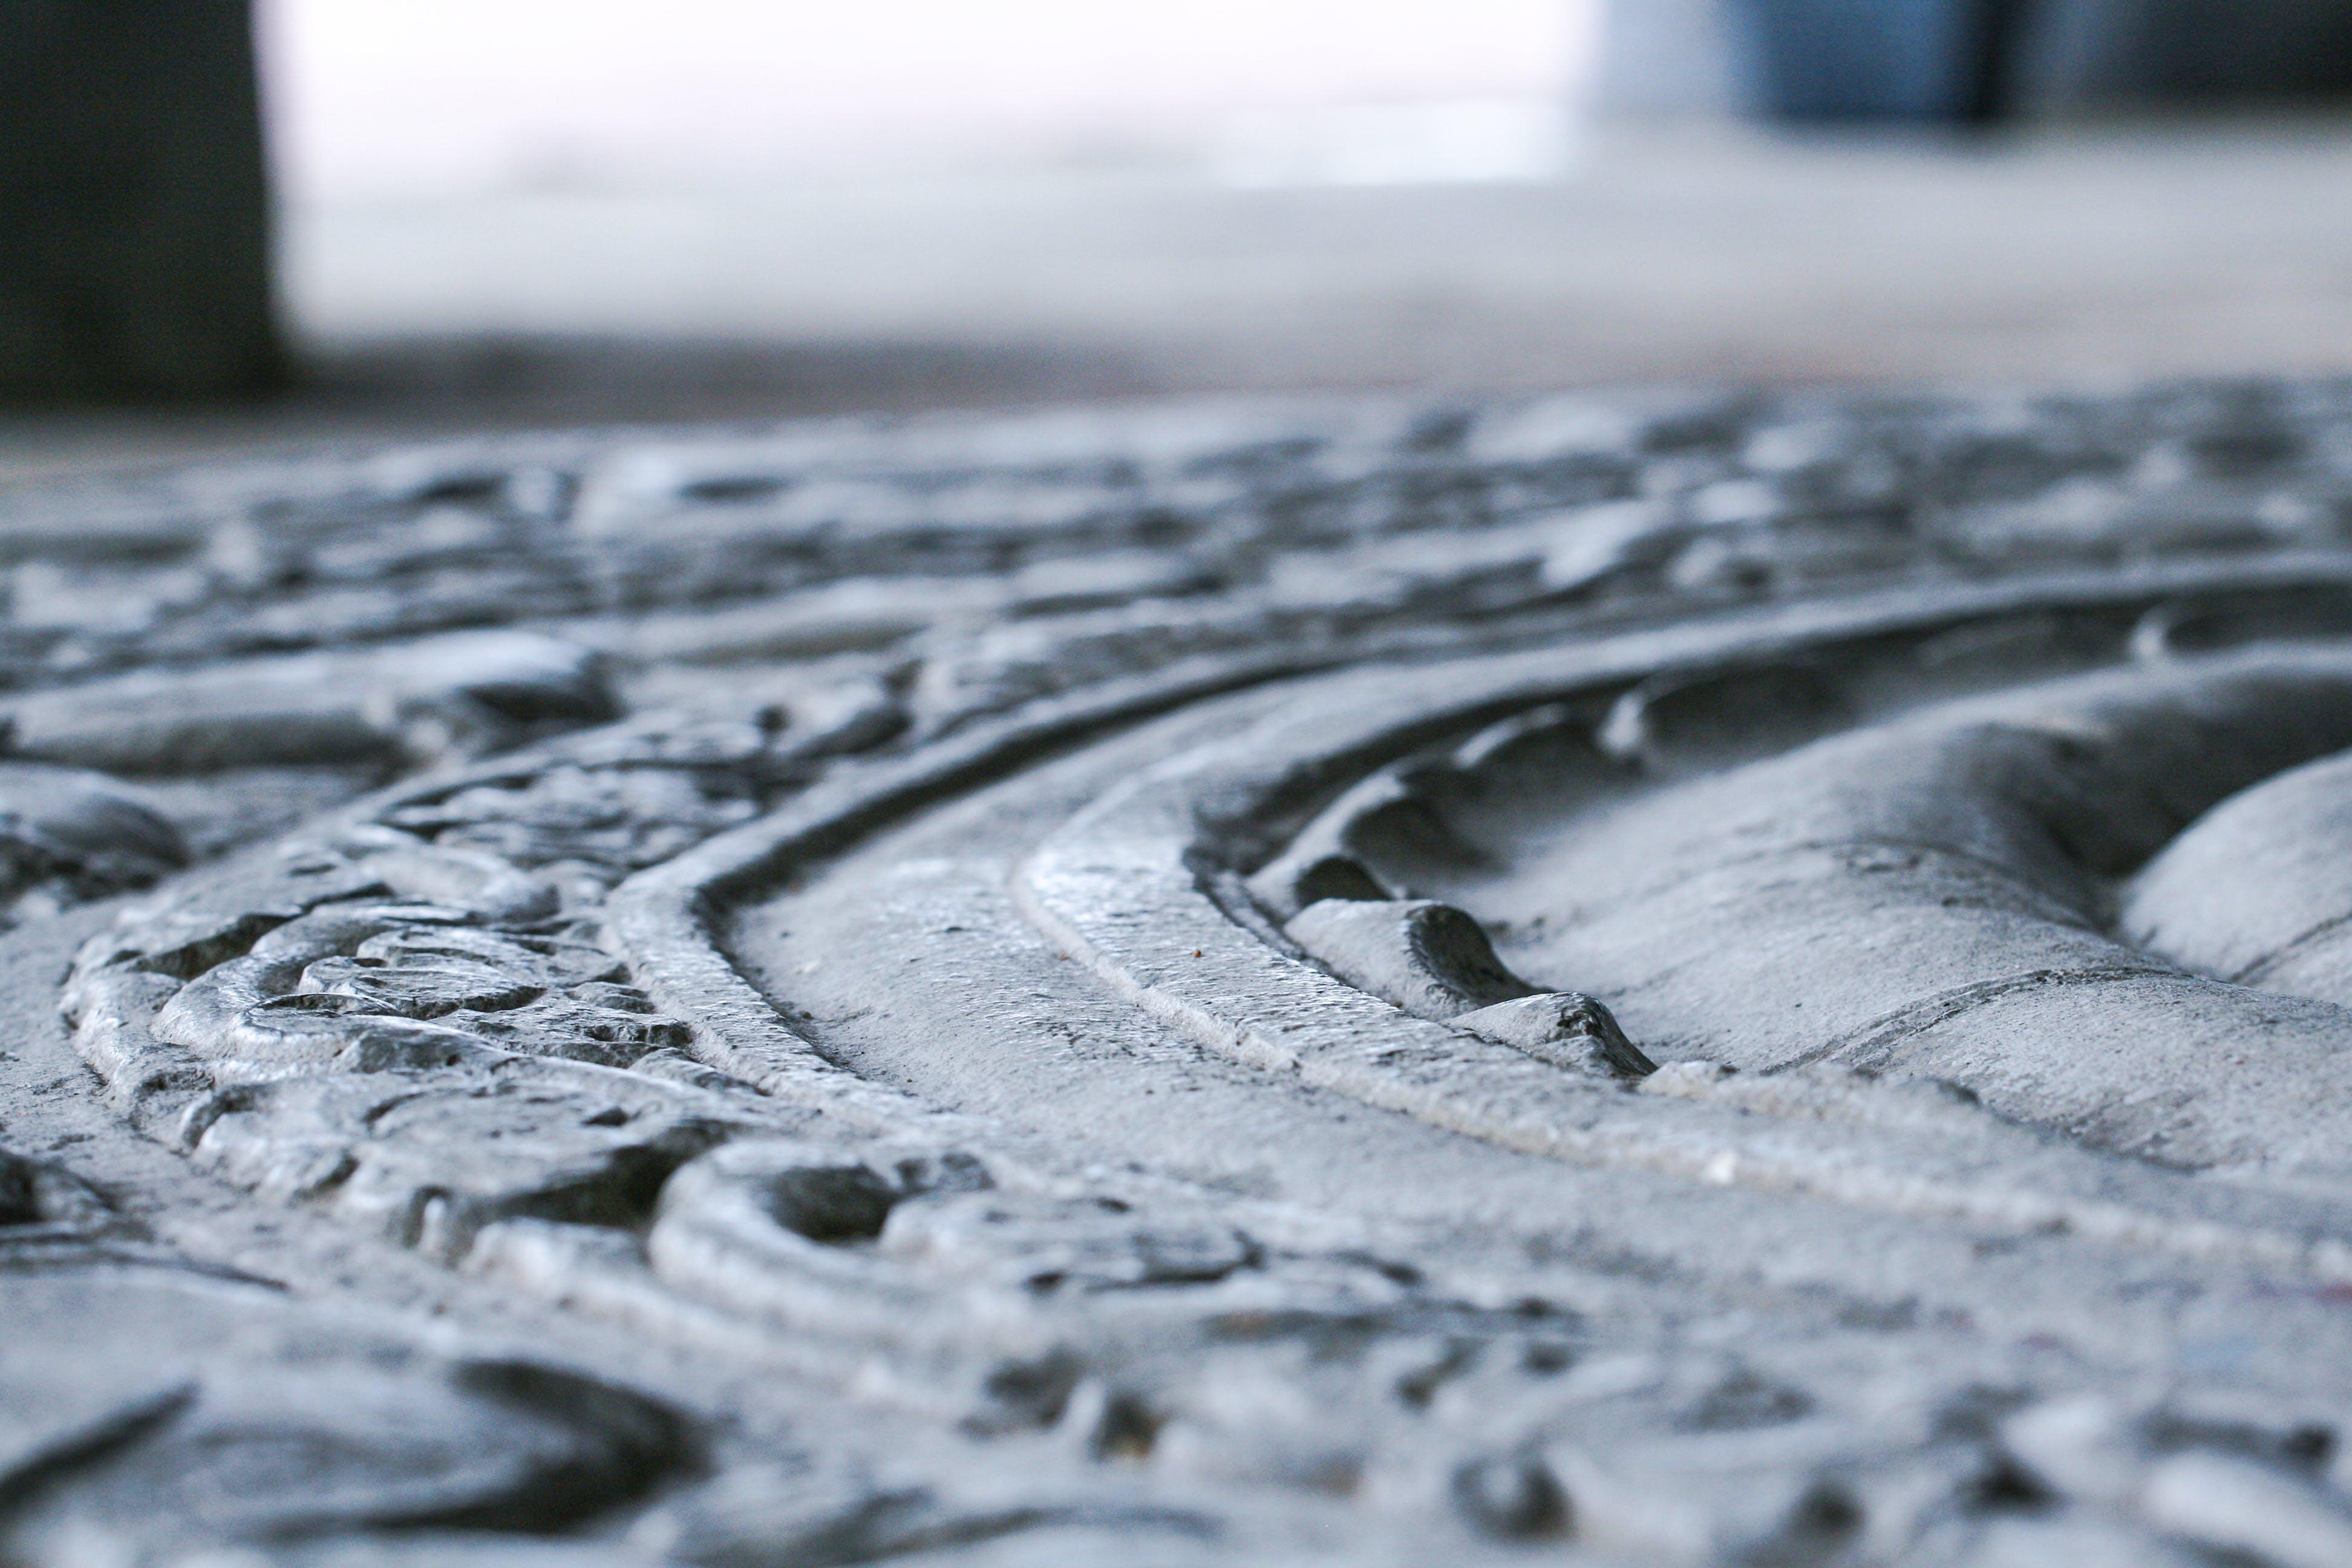 Free stock photo of texture, ground, travel, design